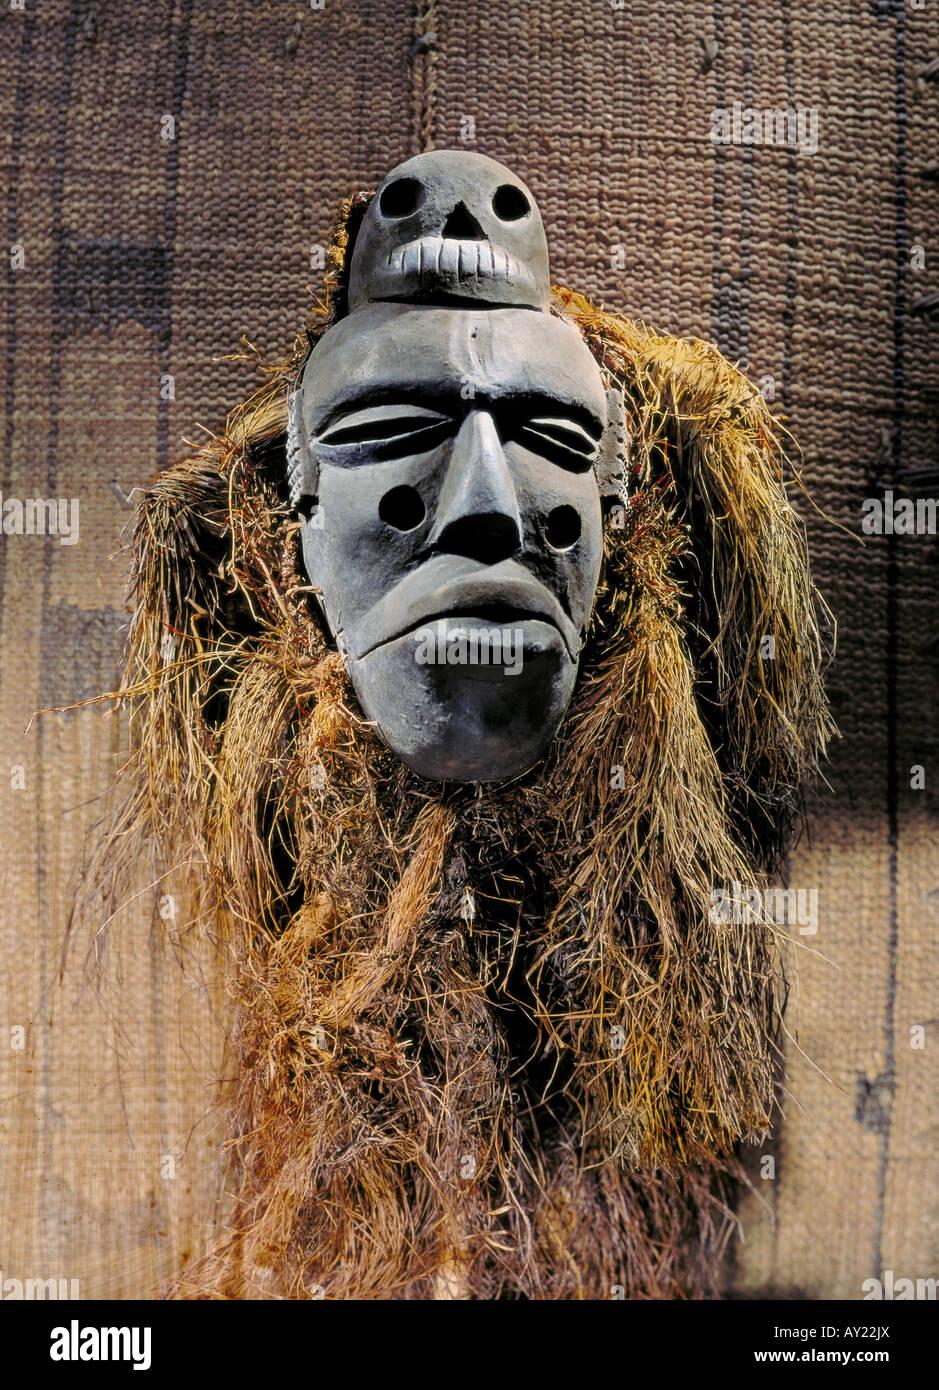 fine arts, Africa, sculpture, masks, Ibibio dancing mask, wood carving, Nigeria, Ethnological Museum Berlin, Artist's - Stock Image